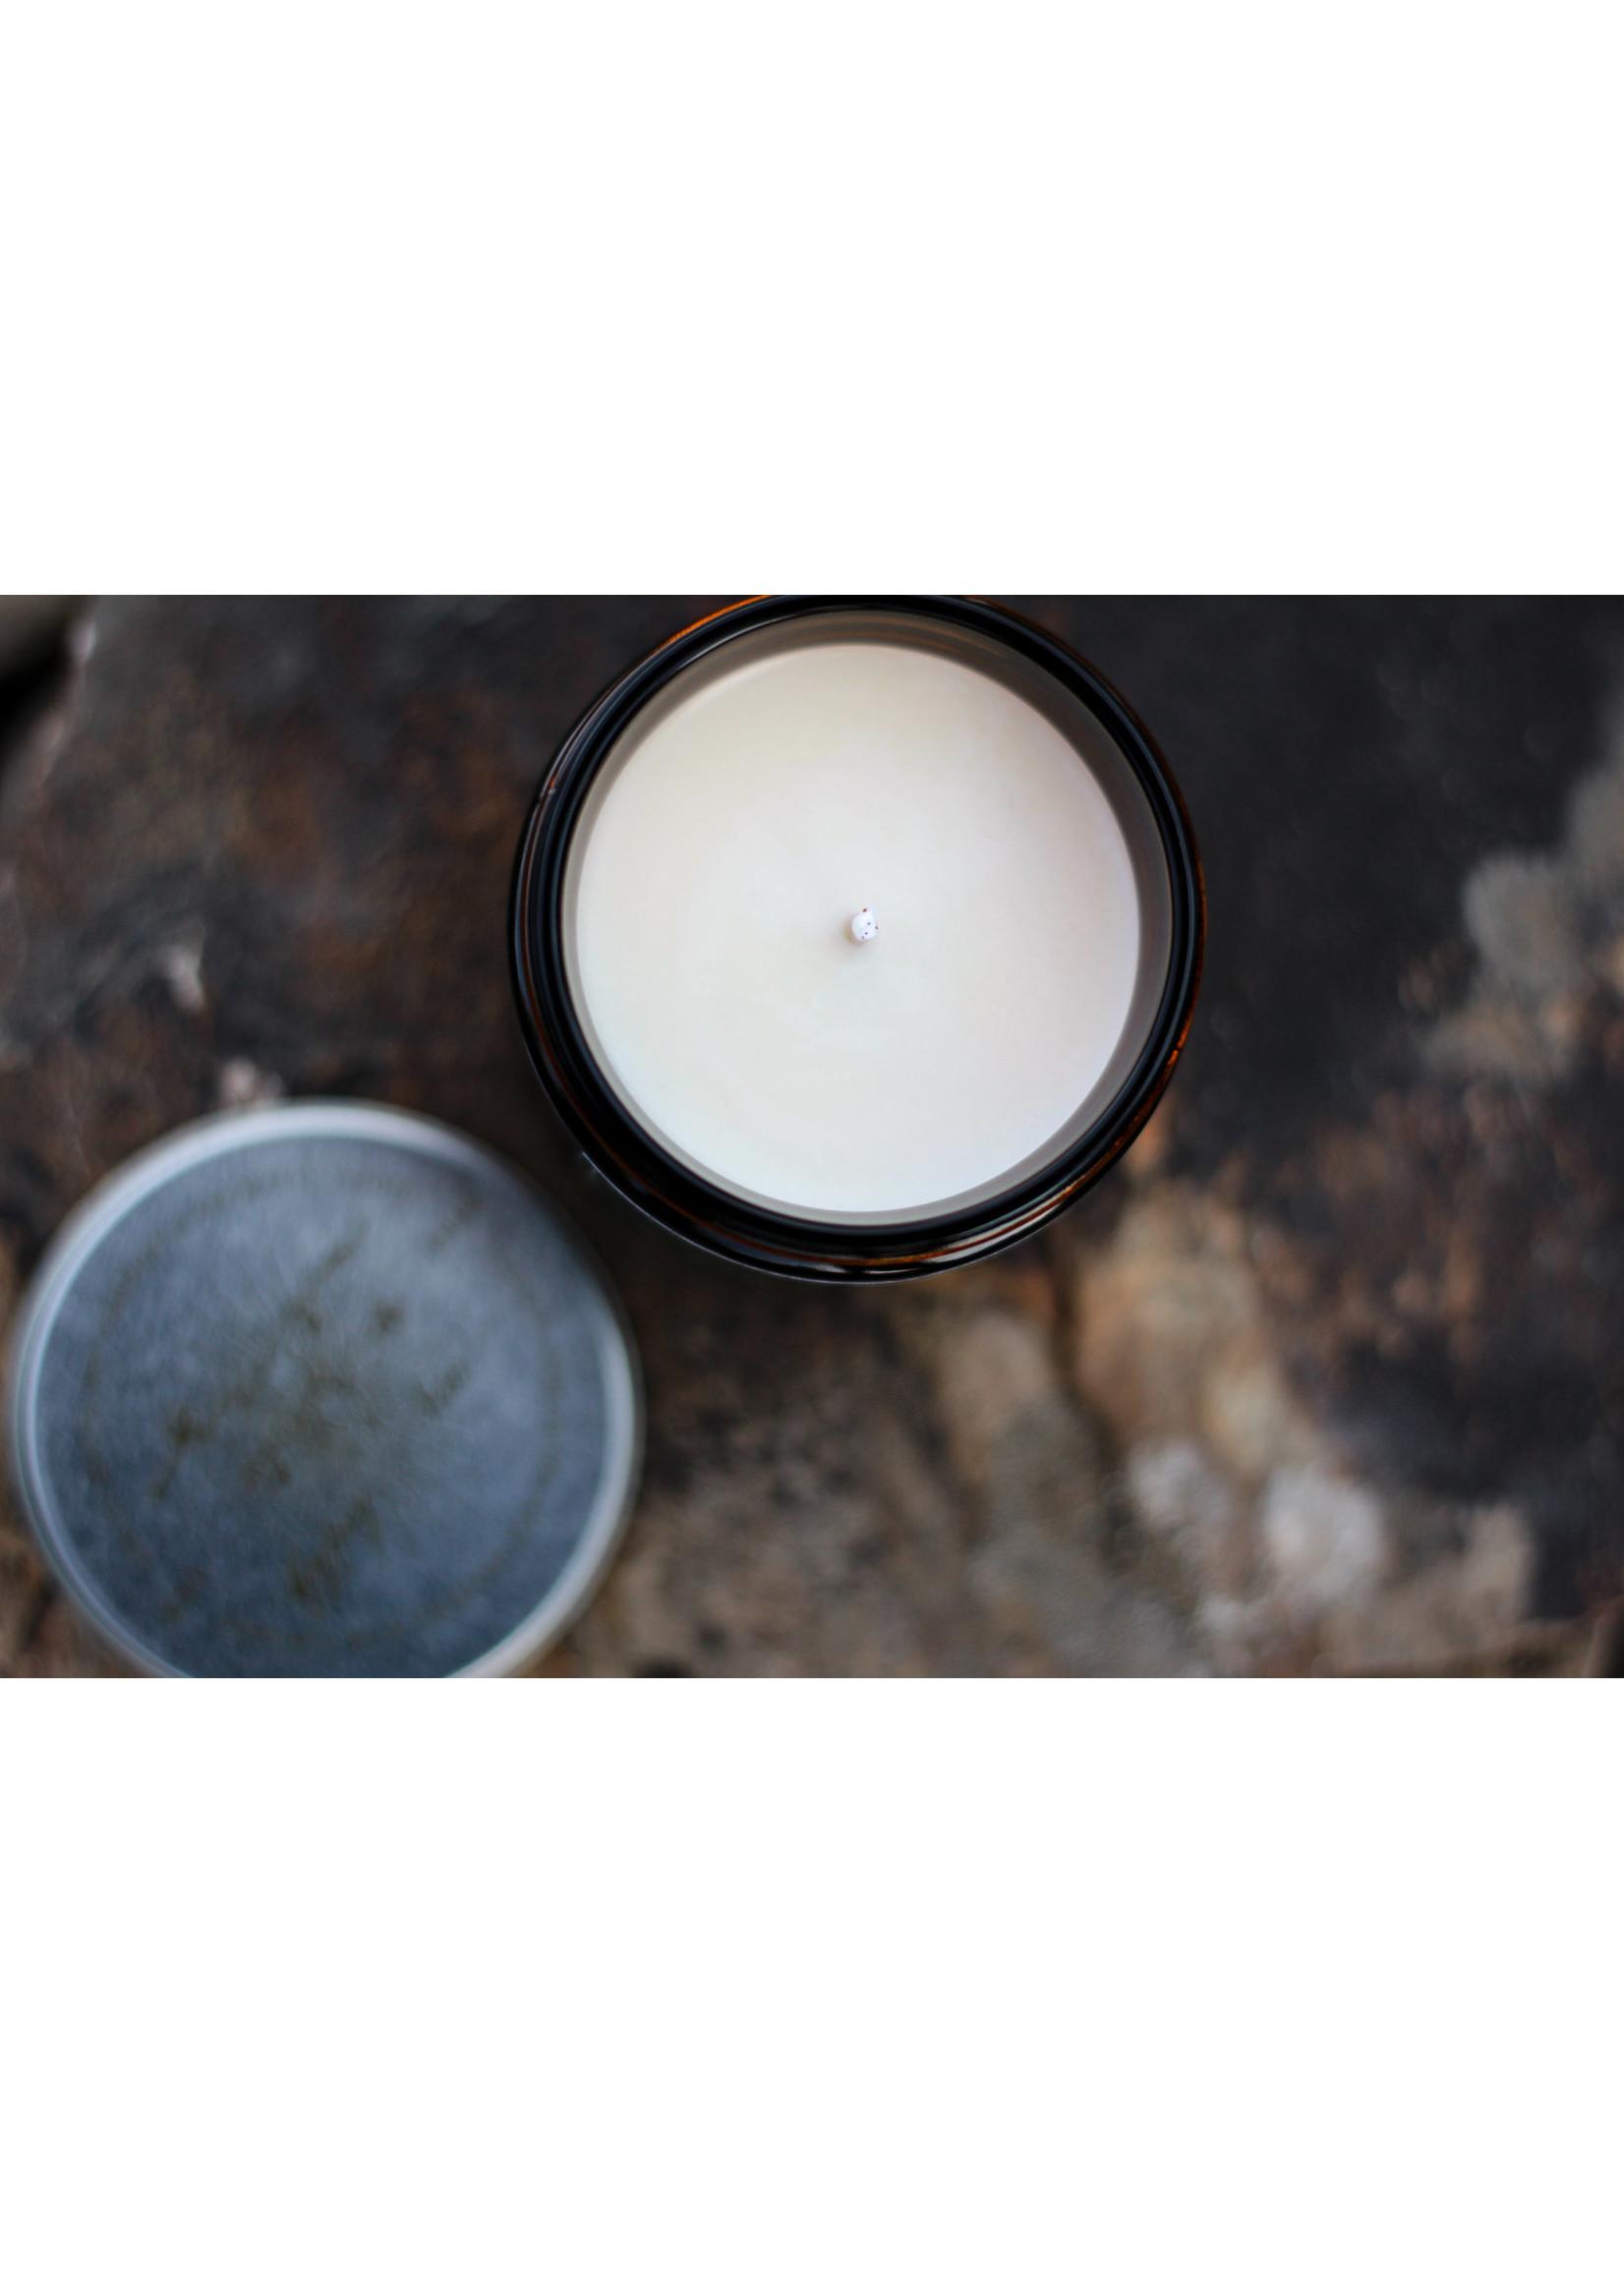 Gypsy Vine Locally Handmade Candle Barefoot